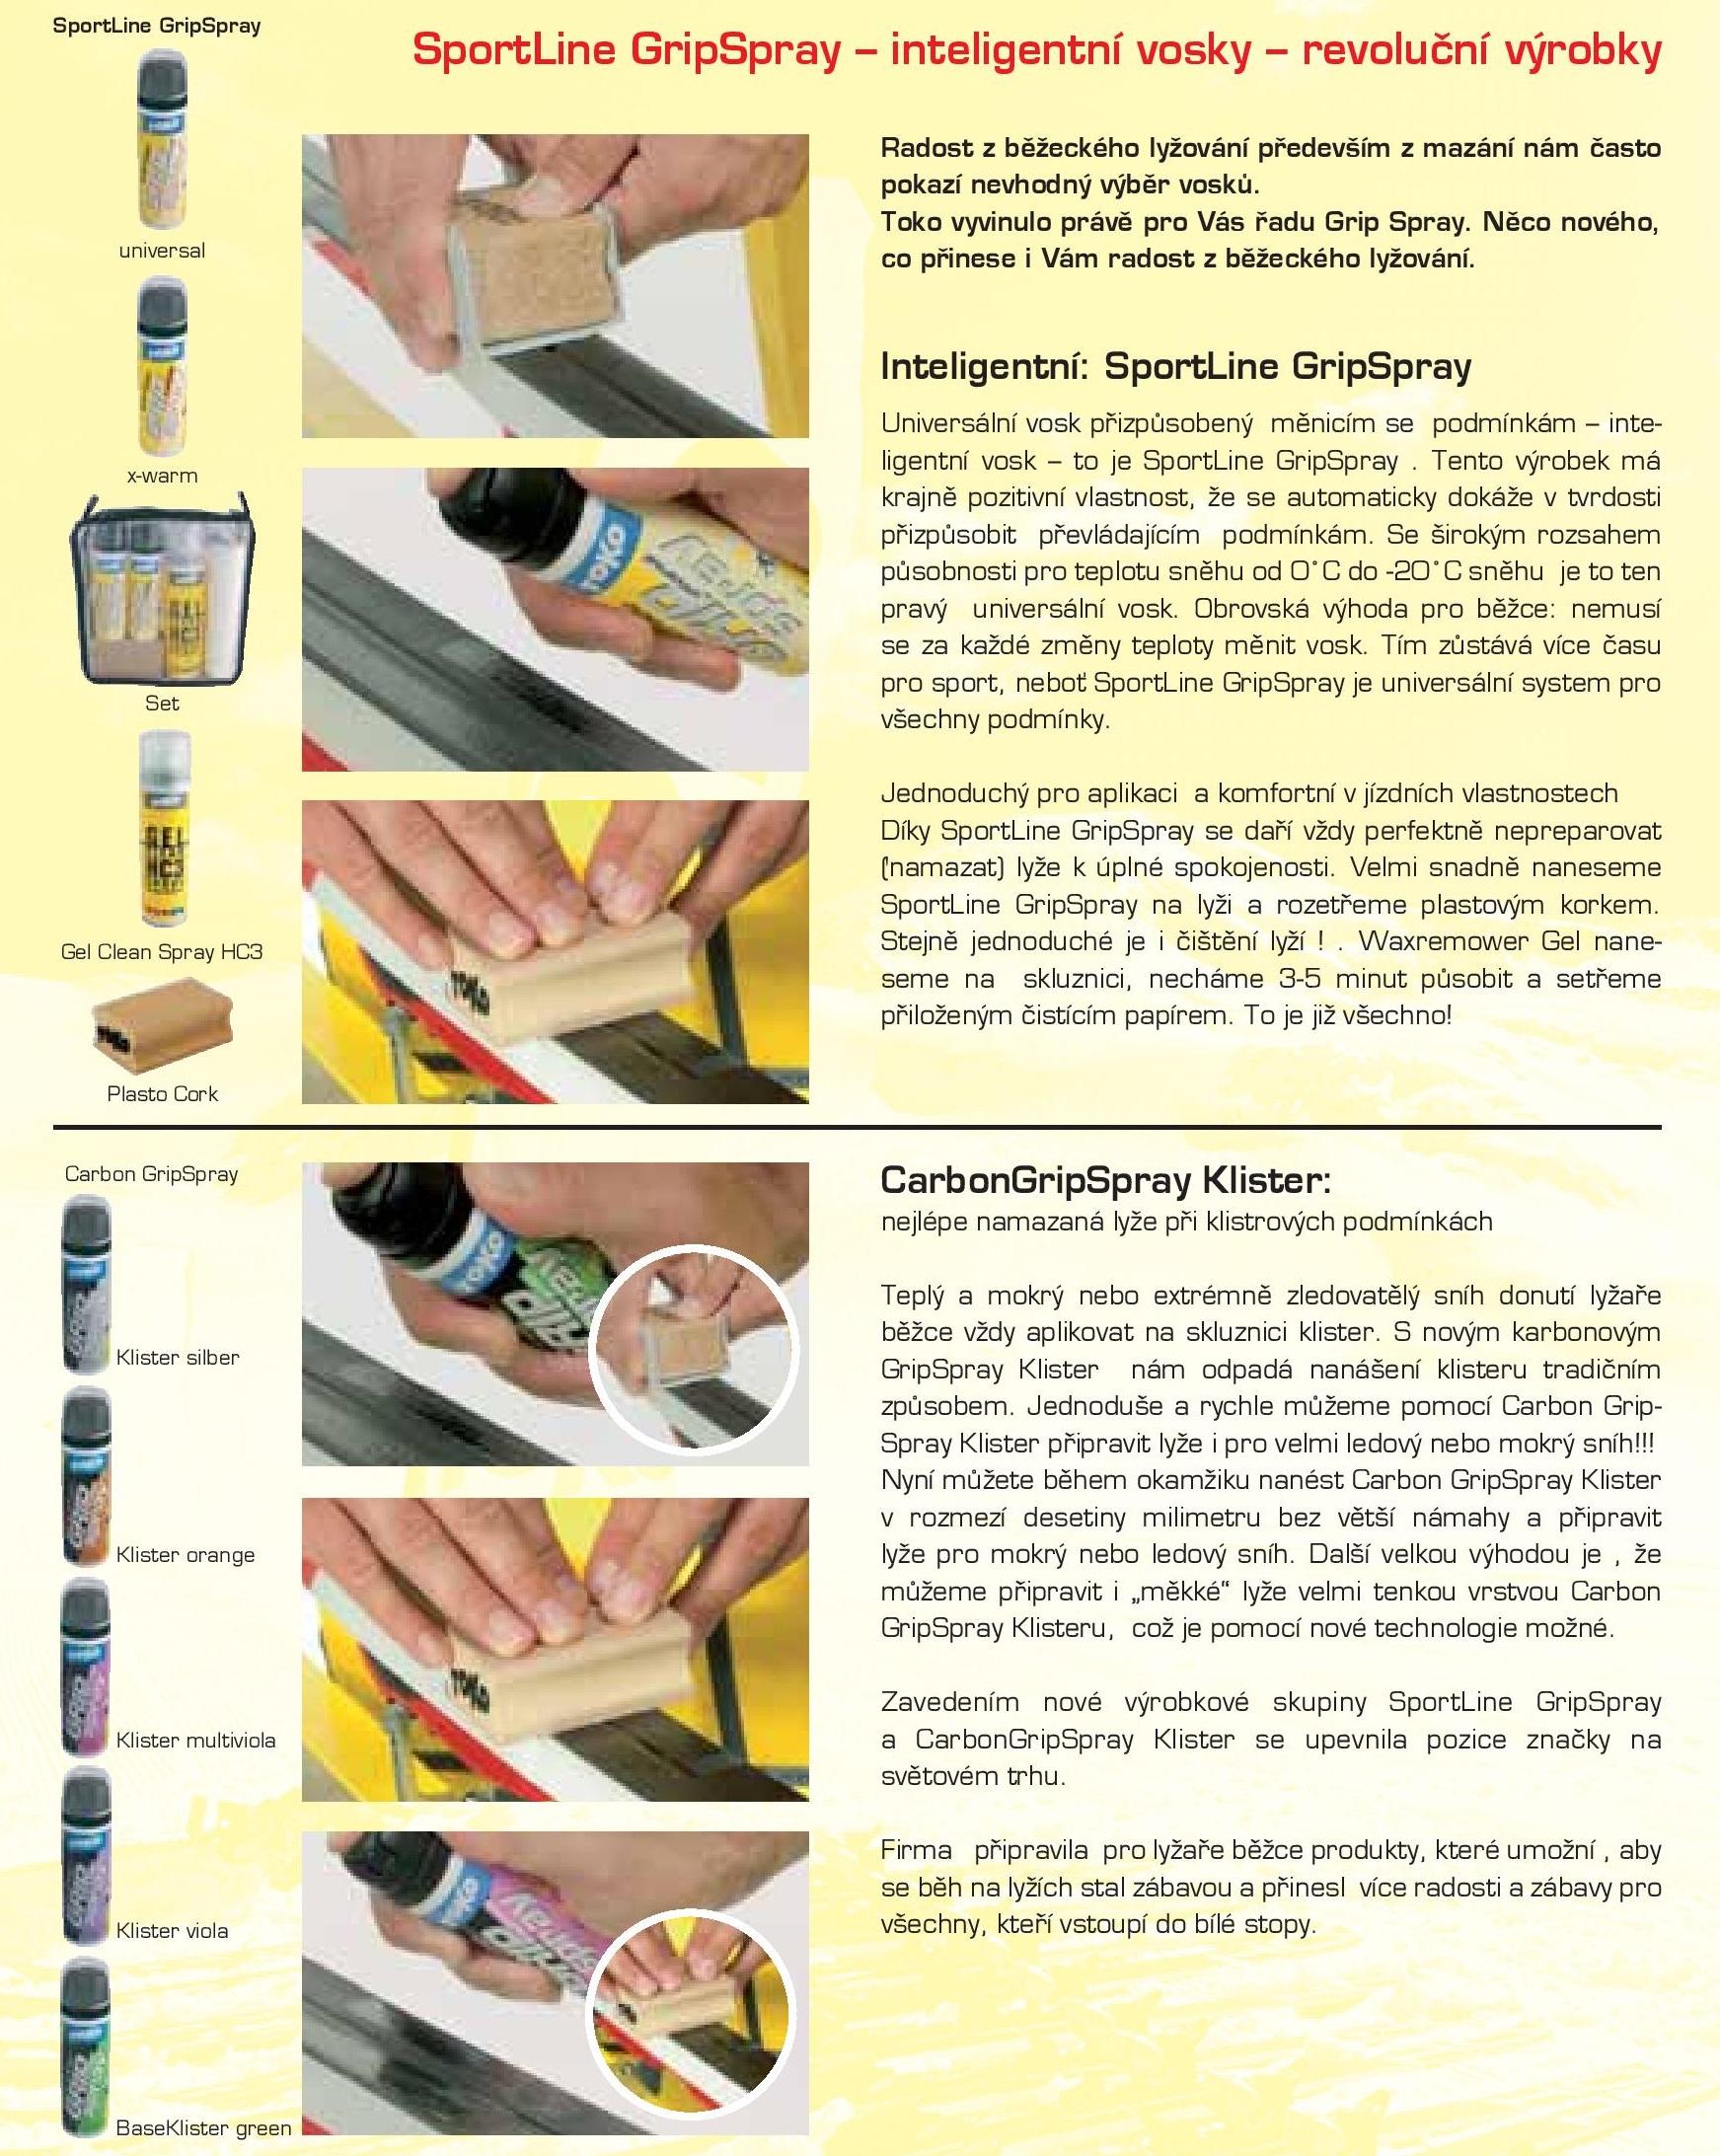 voskovani-brouseni-page-015